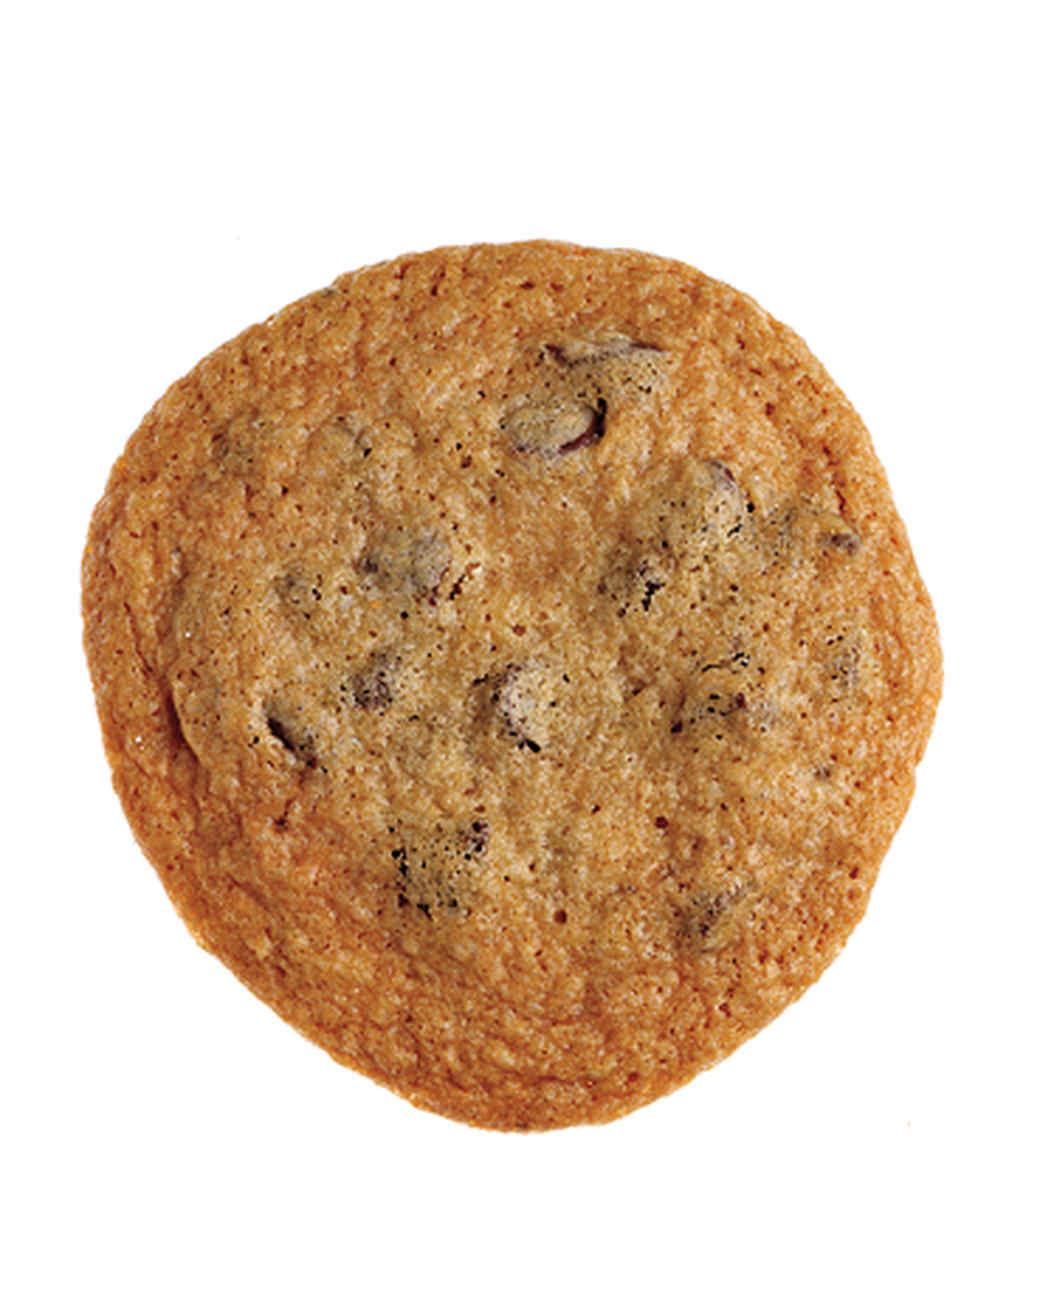 Tates sugar cookie recipe